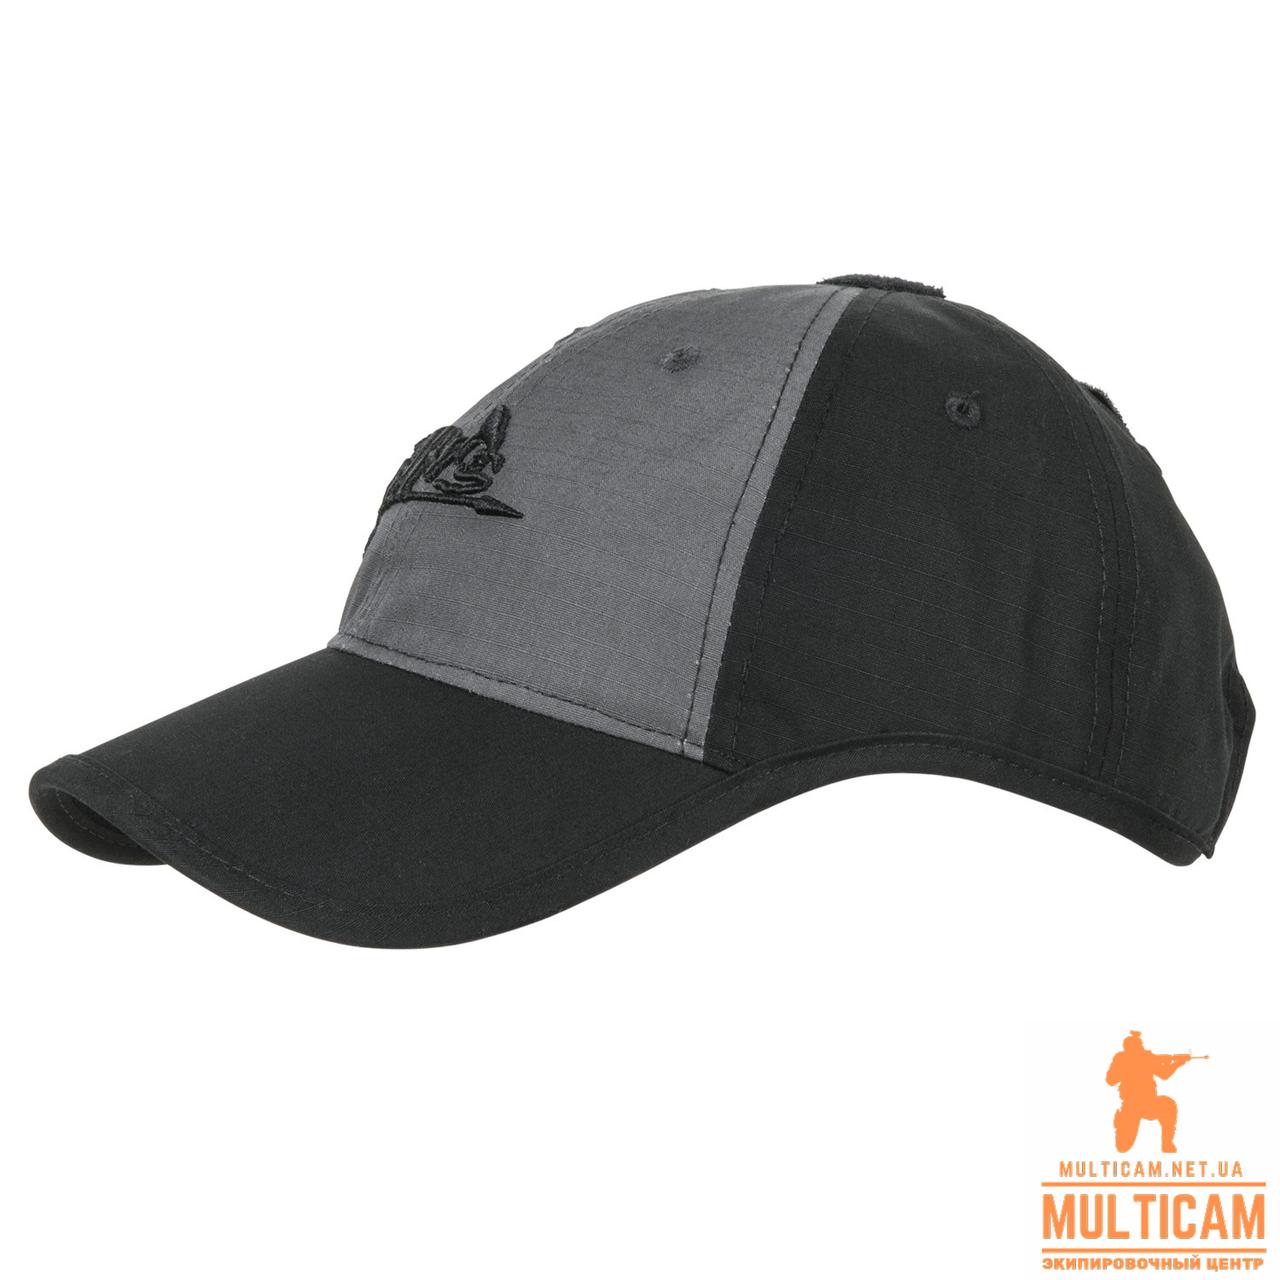 Бейсболка Helikon-Tex® Logo Cap - PolyCotton Ripstop - Shadow Grey/Black